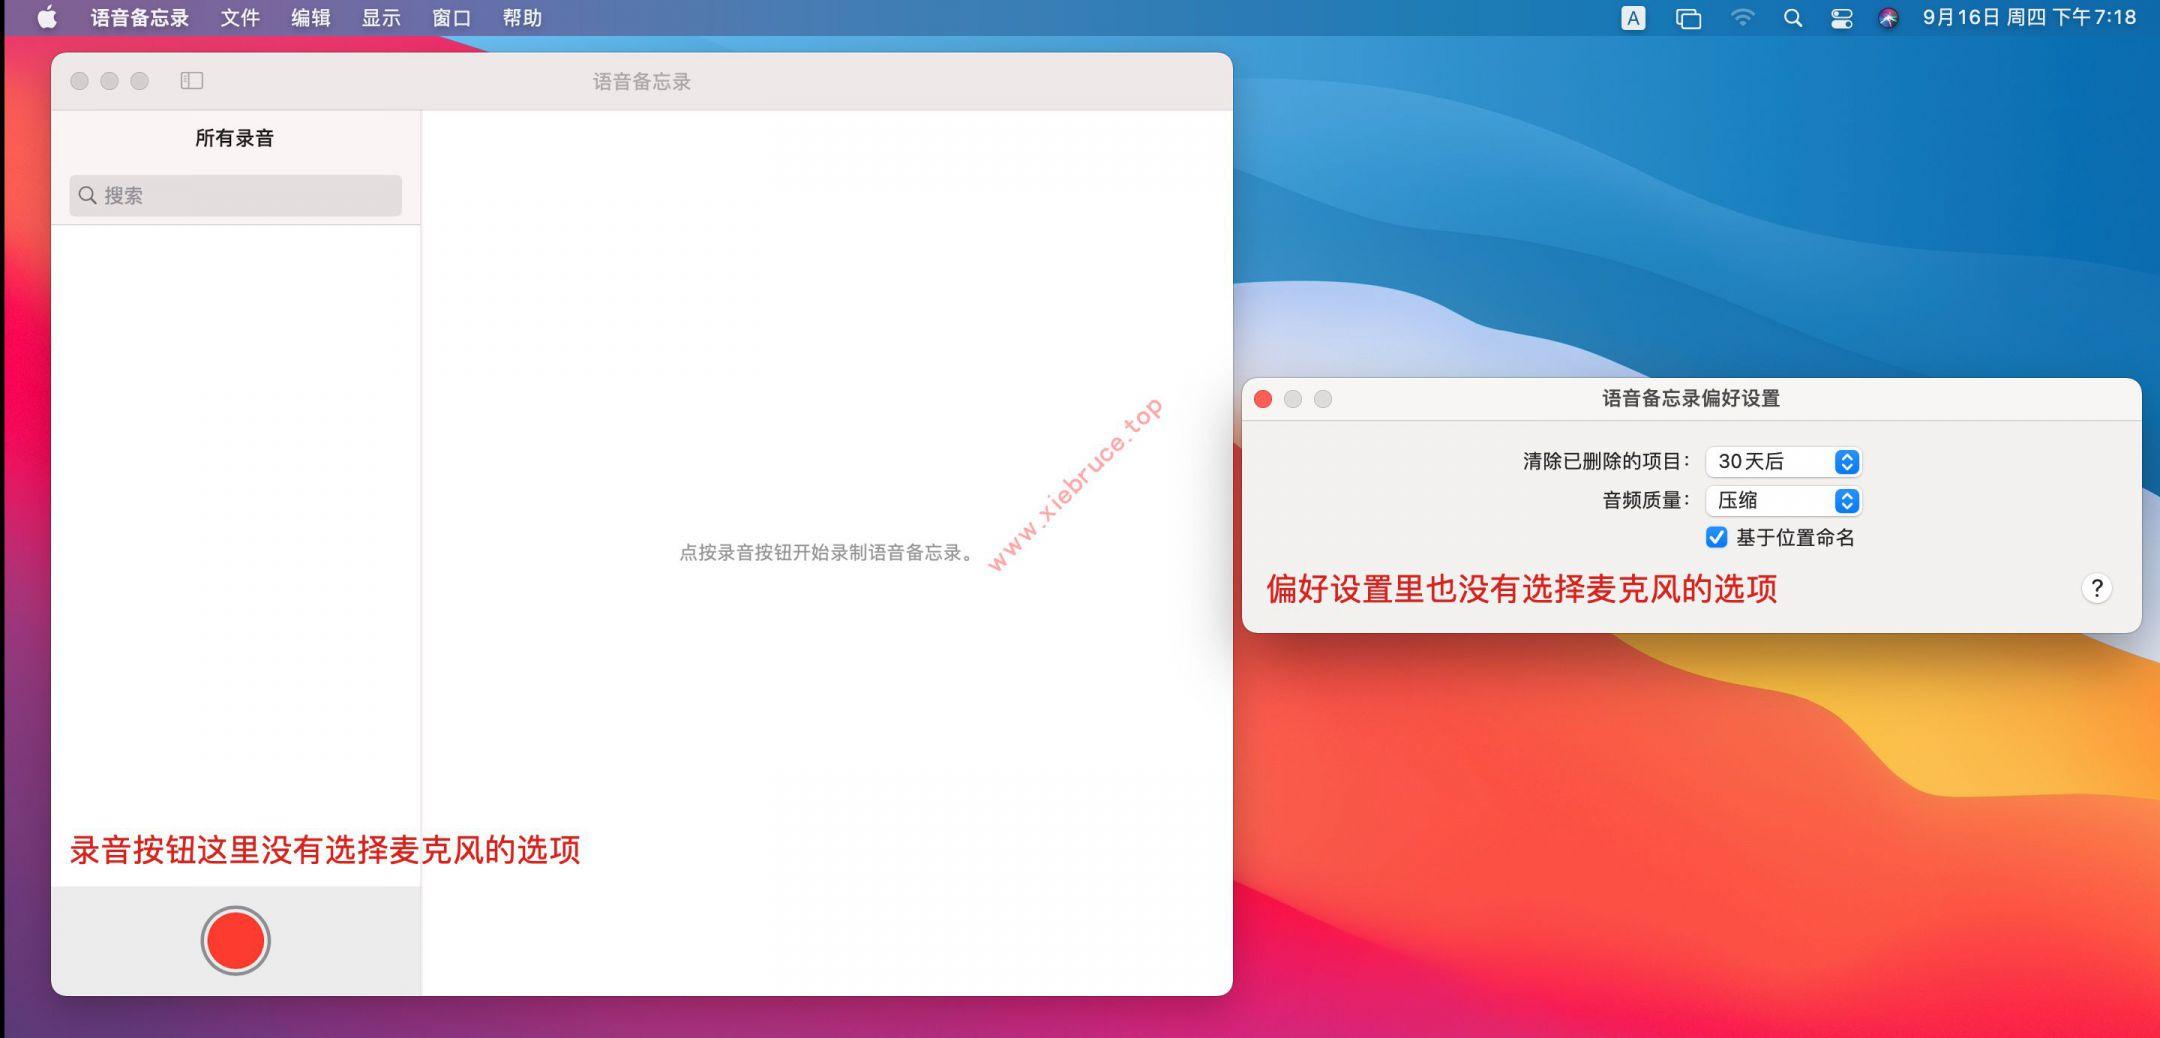 Xnip2021-09-16_19-19-16.jpg